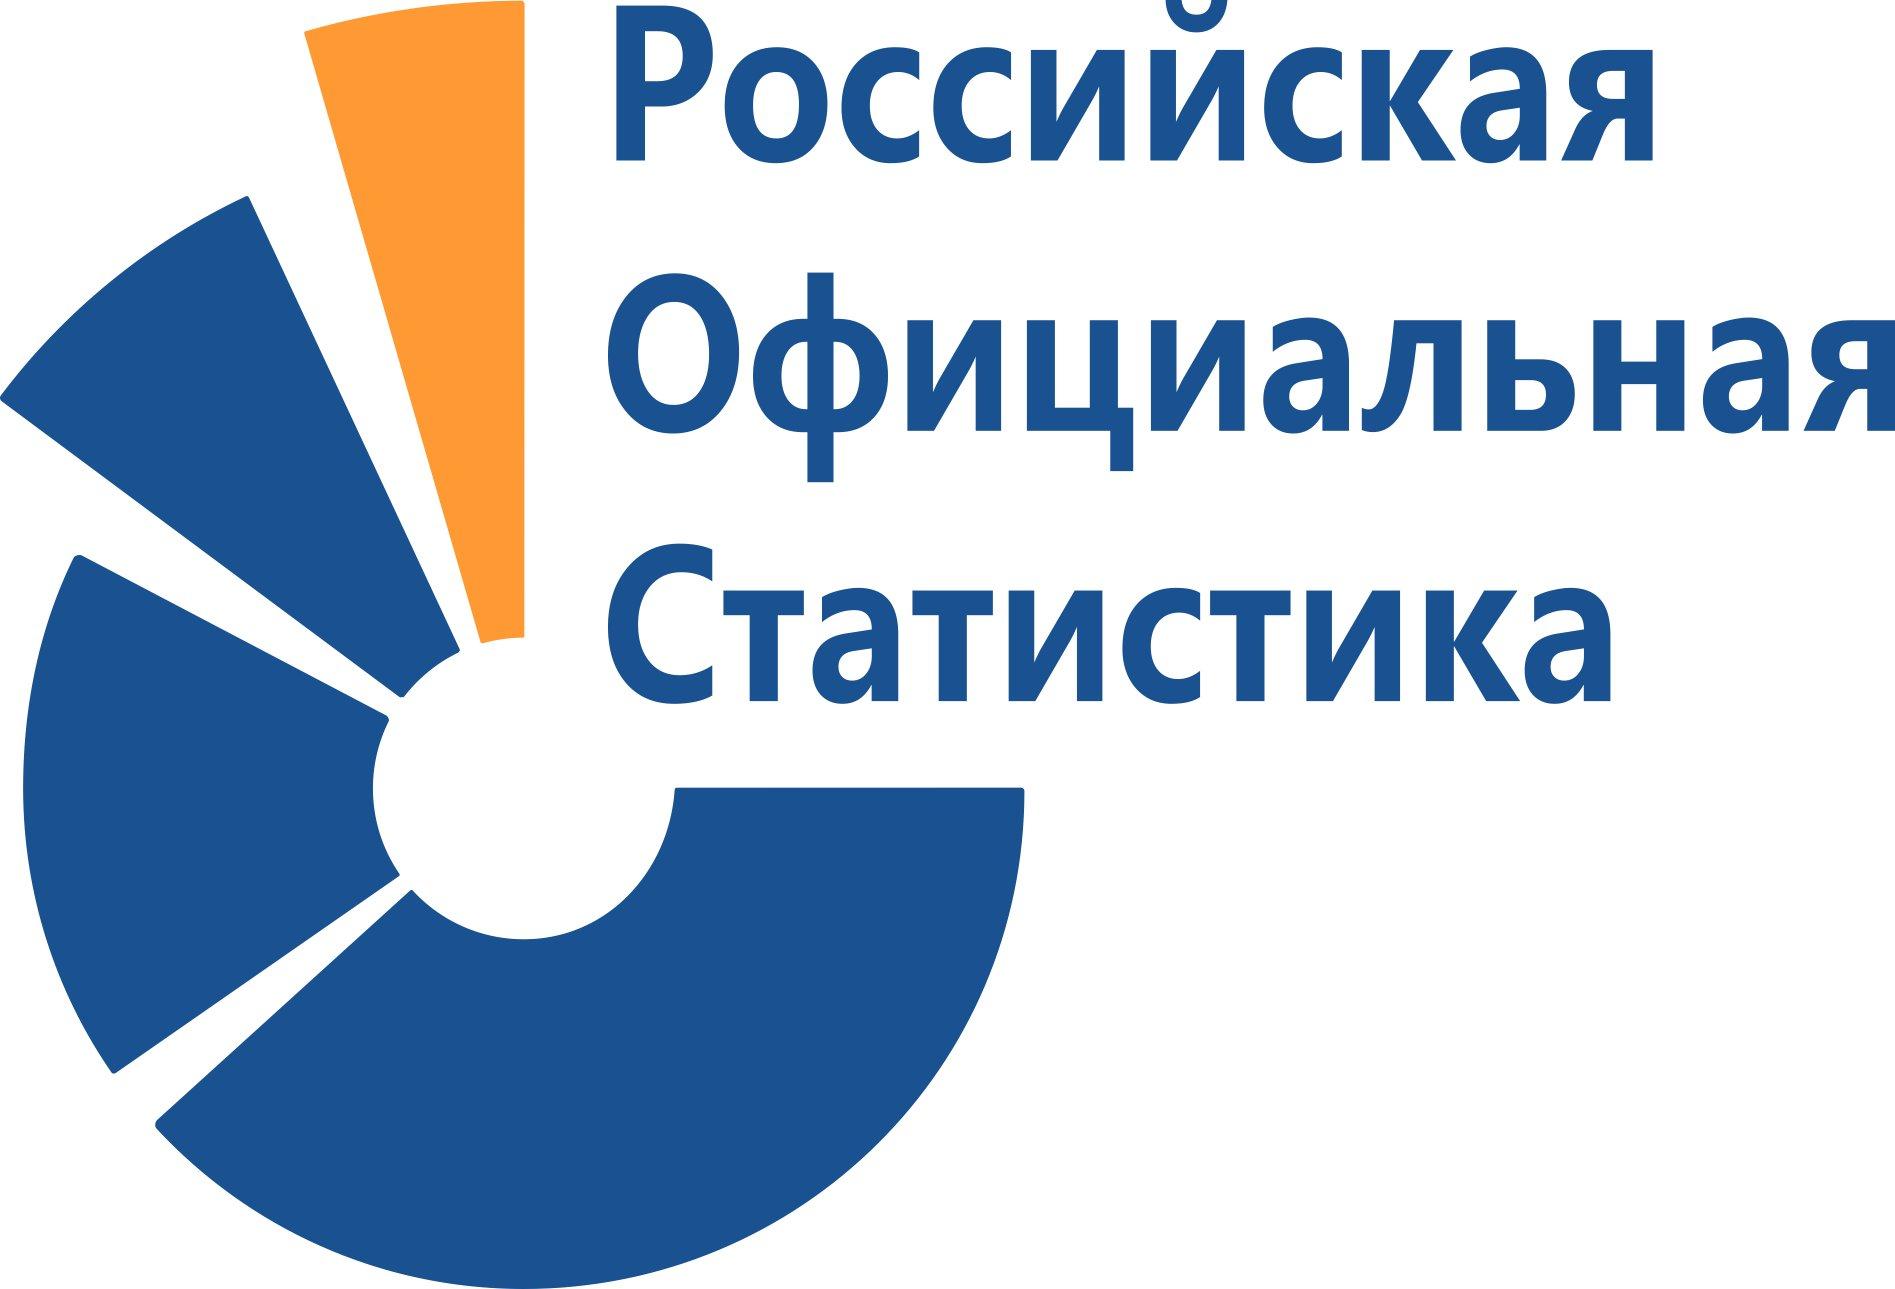 ... логотипе модулями, образующими: www.gks.ru/free_doc/new_site/rosstat/smi/logo.htm